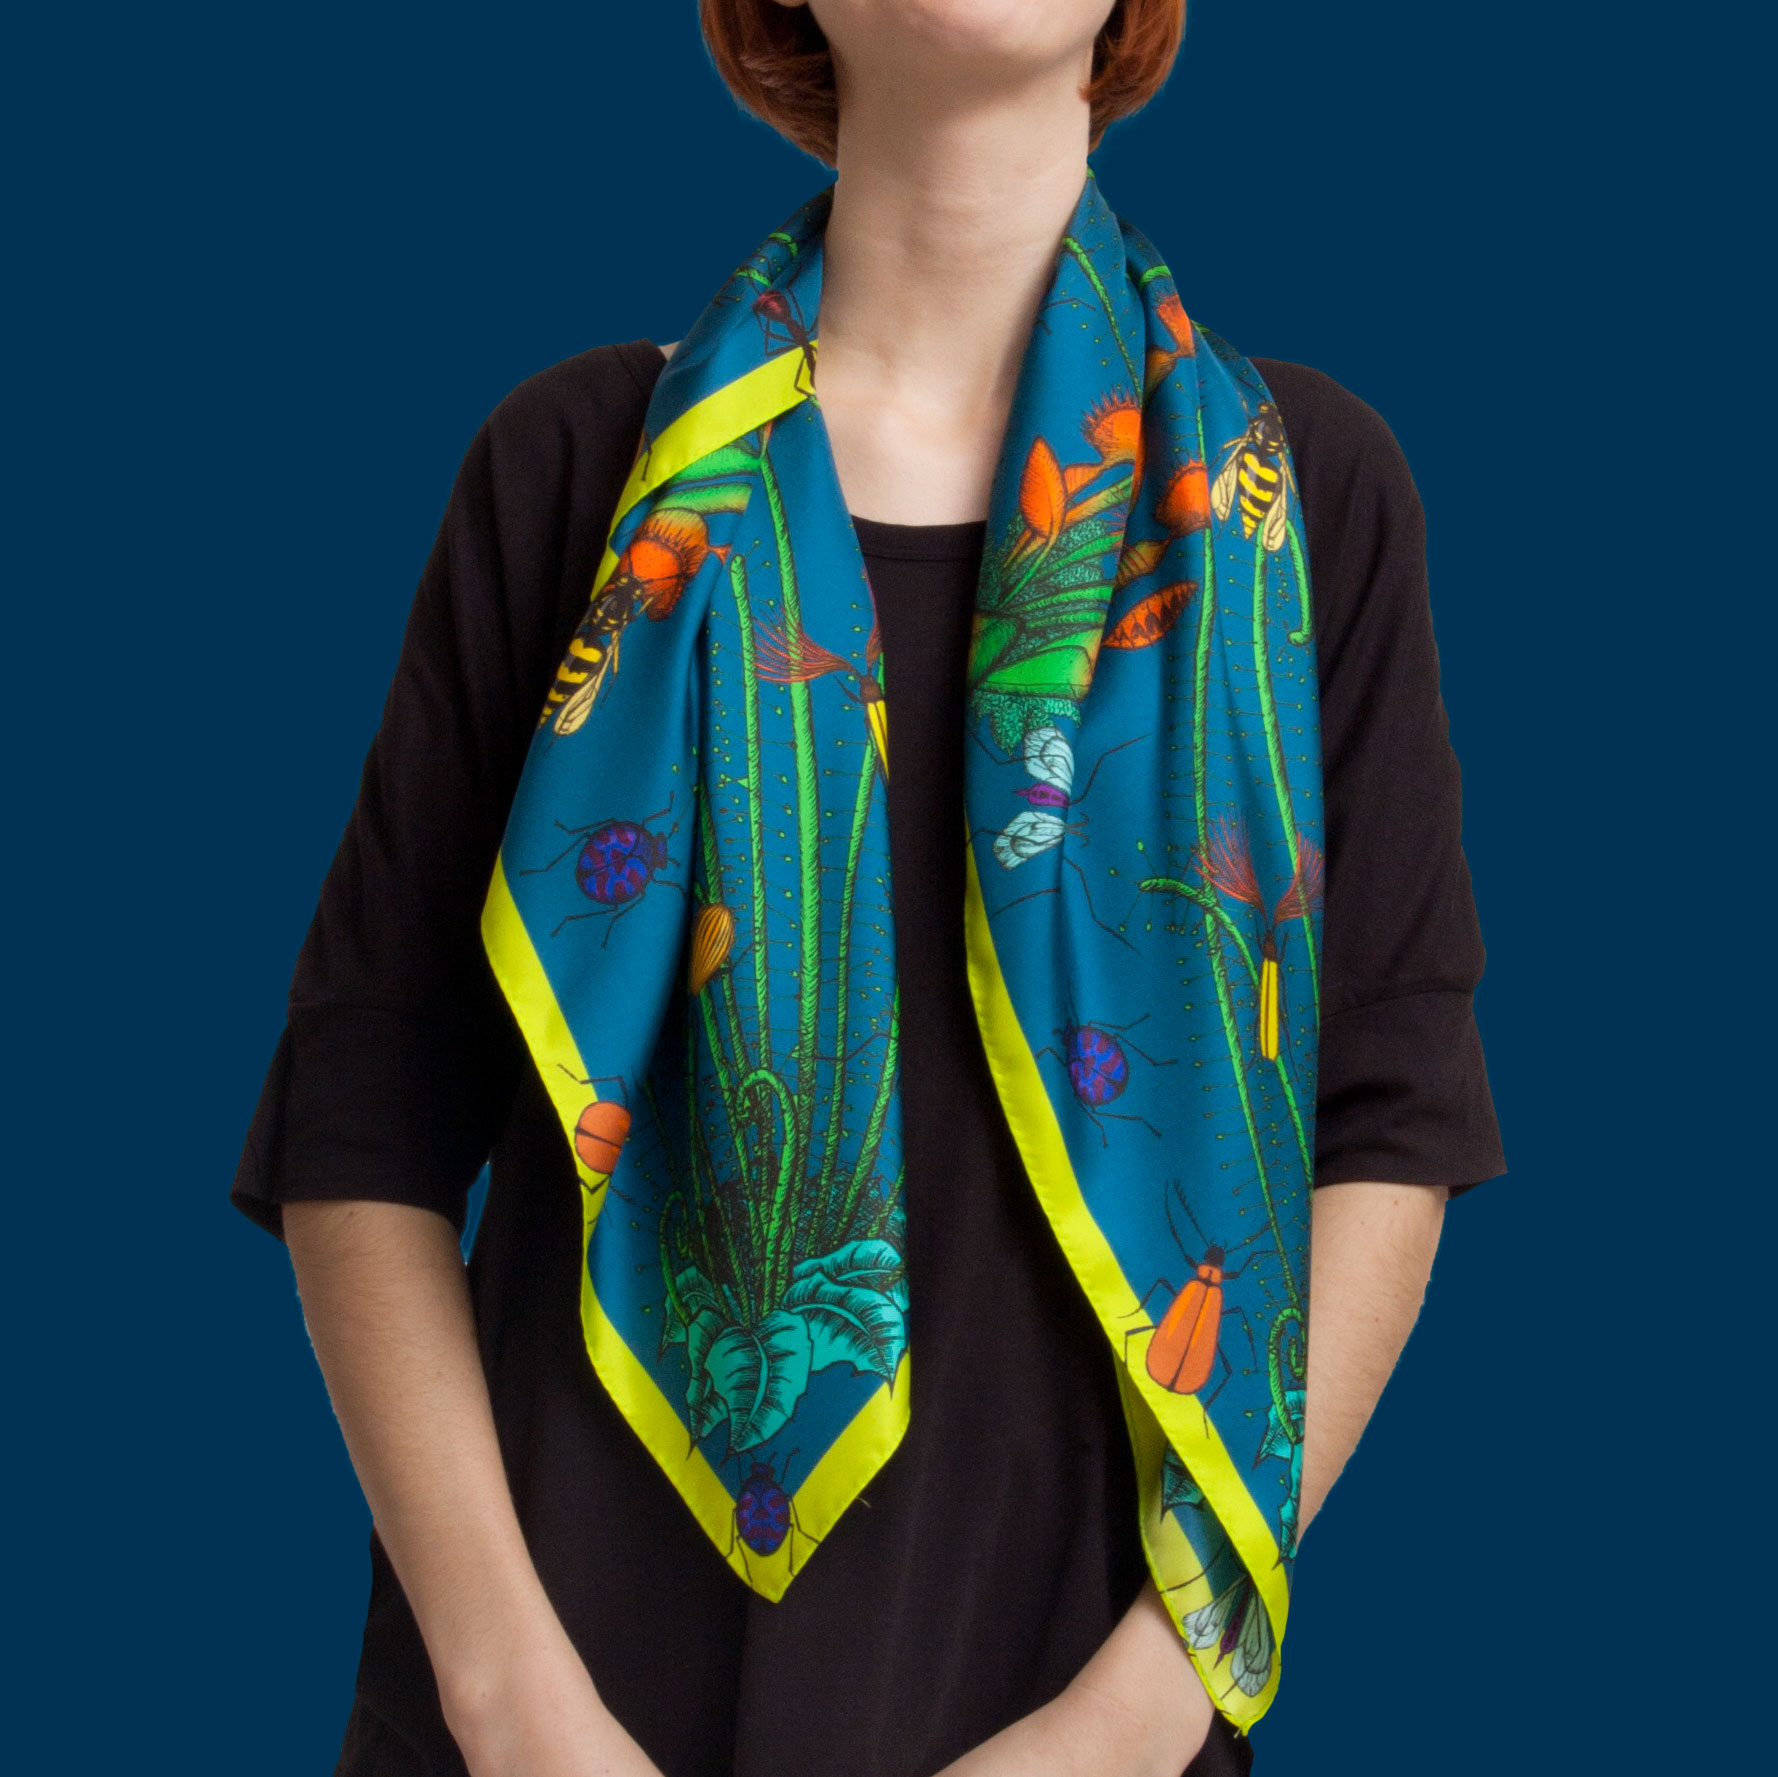 Femme portant un foulard couleur bleu canard